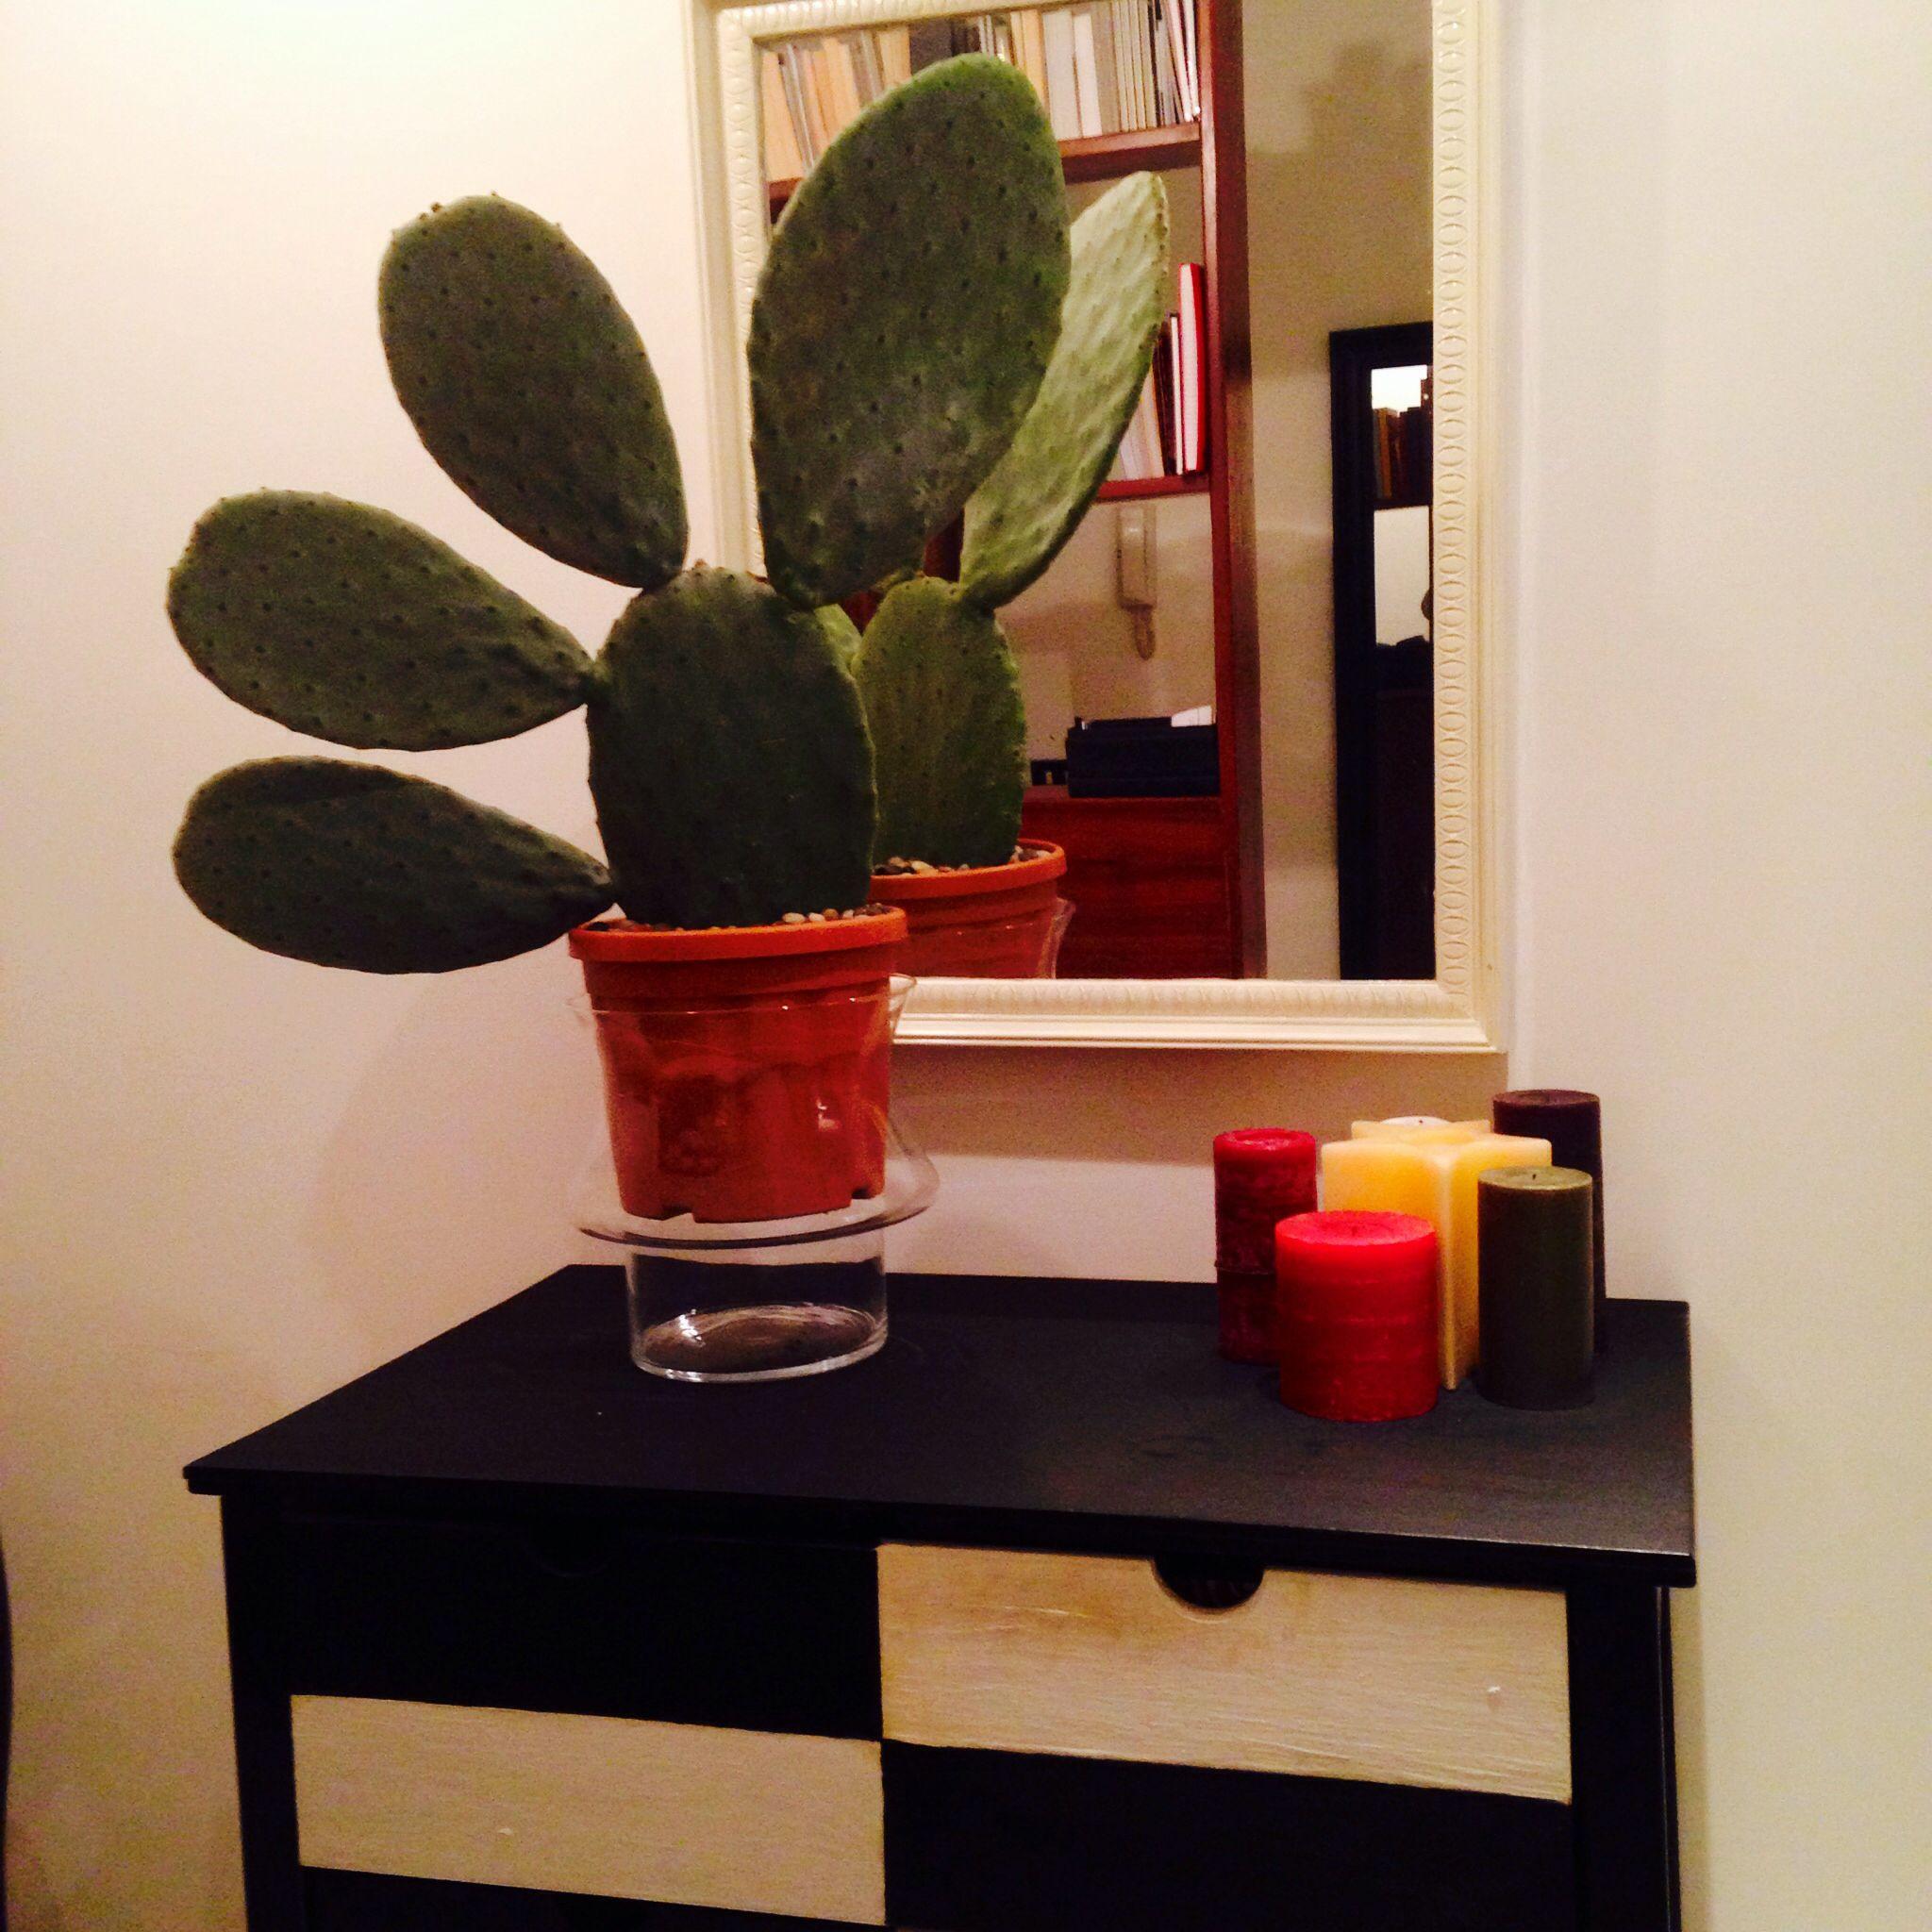 Kaktus!!!